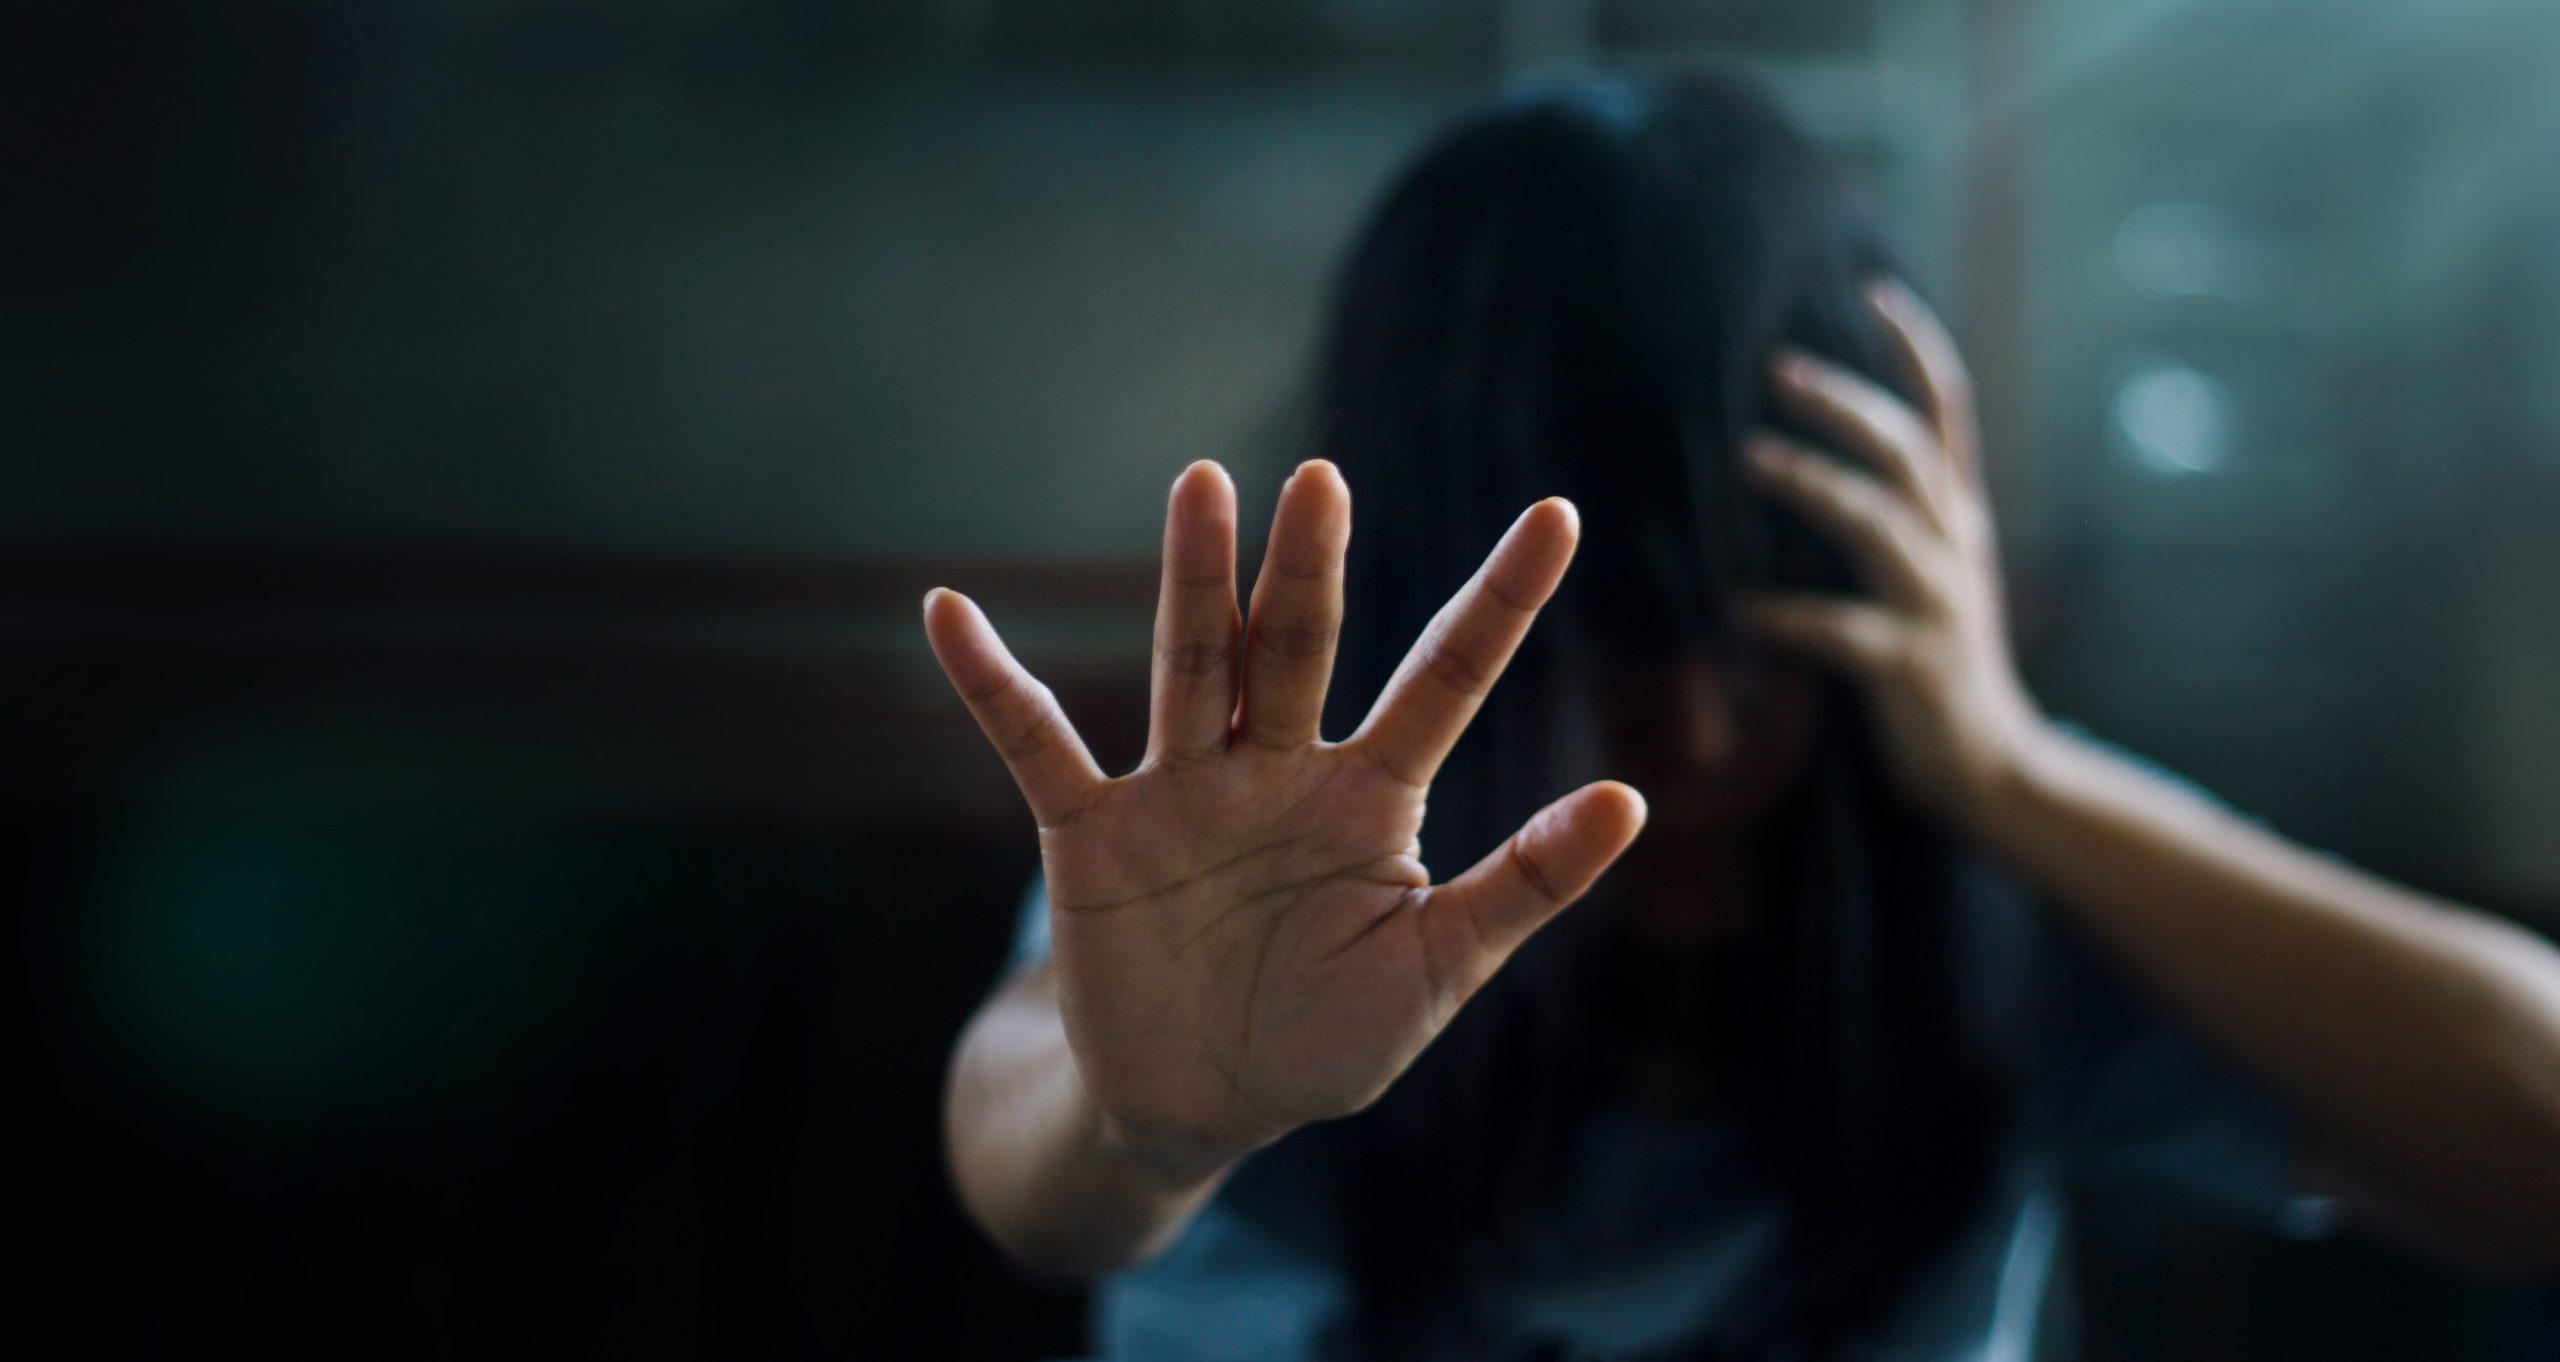 Self-Harm On The Increase Among Young Girls